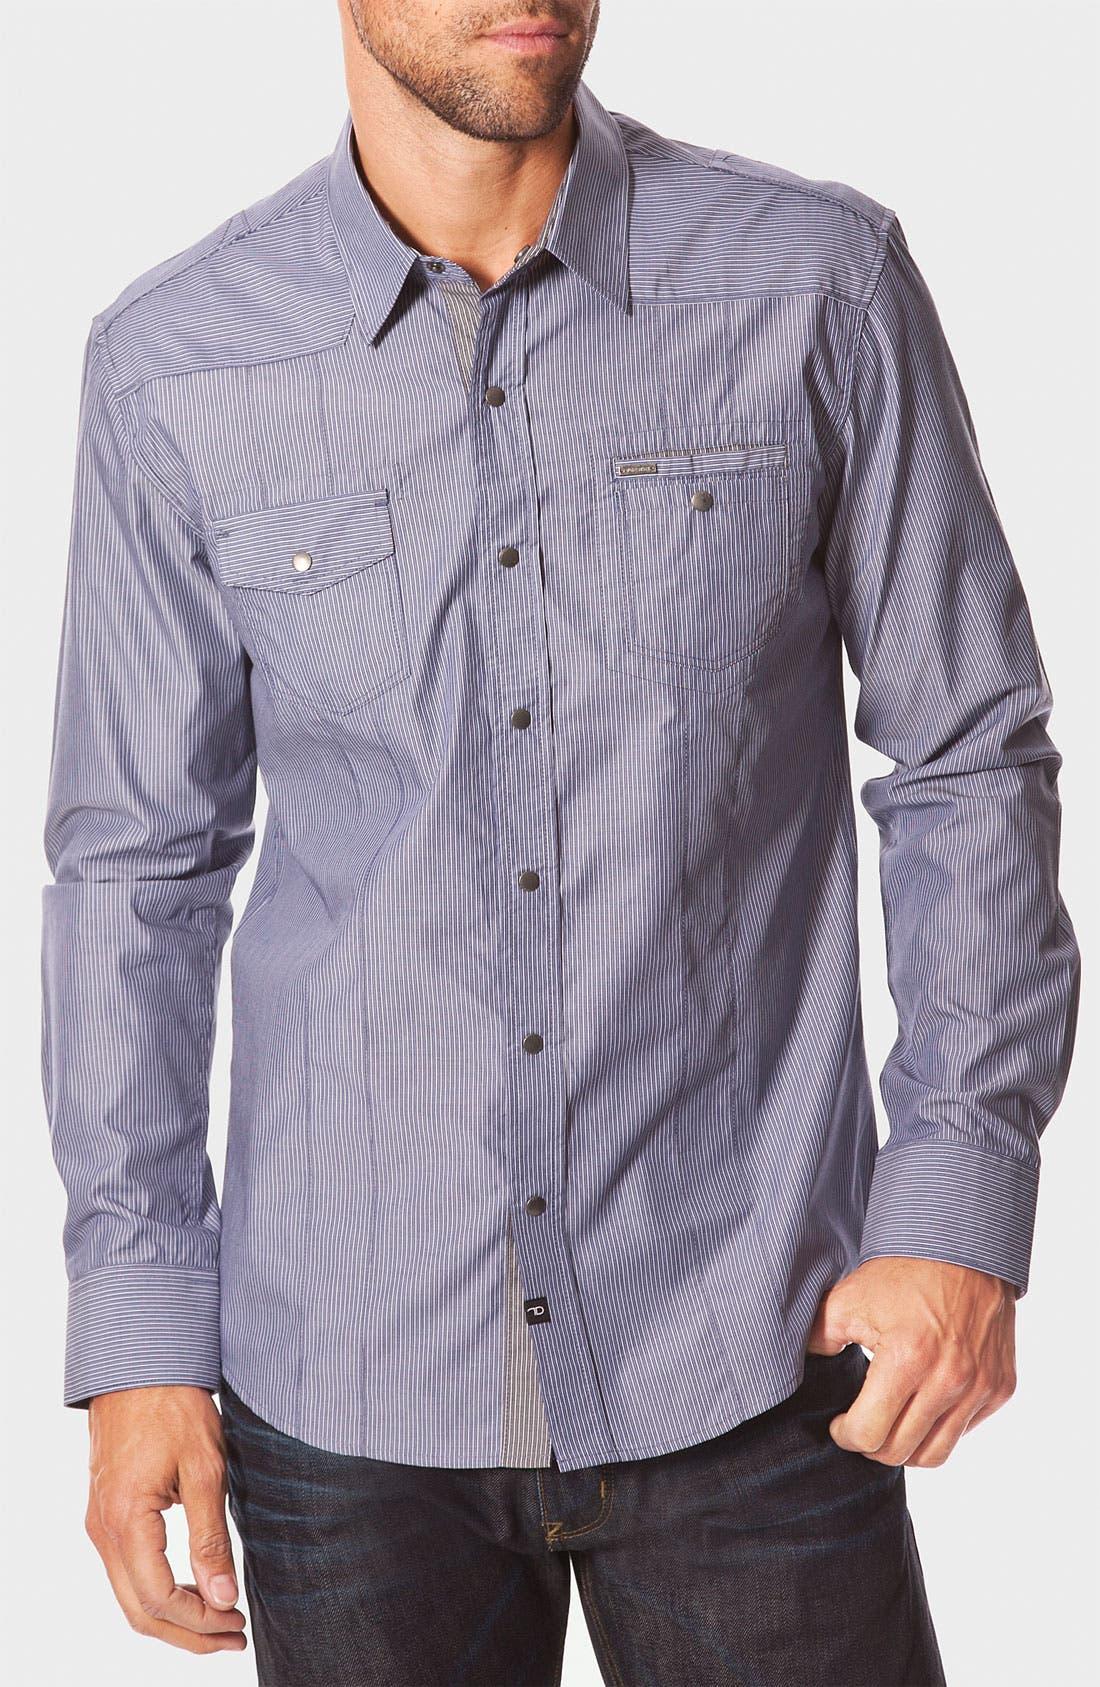 Main Image - 7 Diamonds 'Work Station' Pinstripe Work Shirt